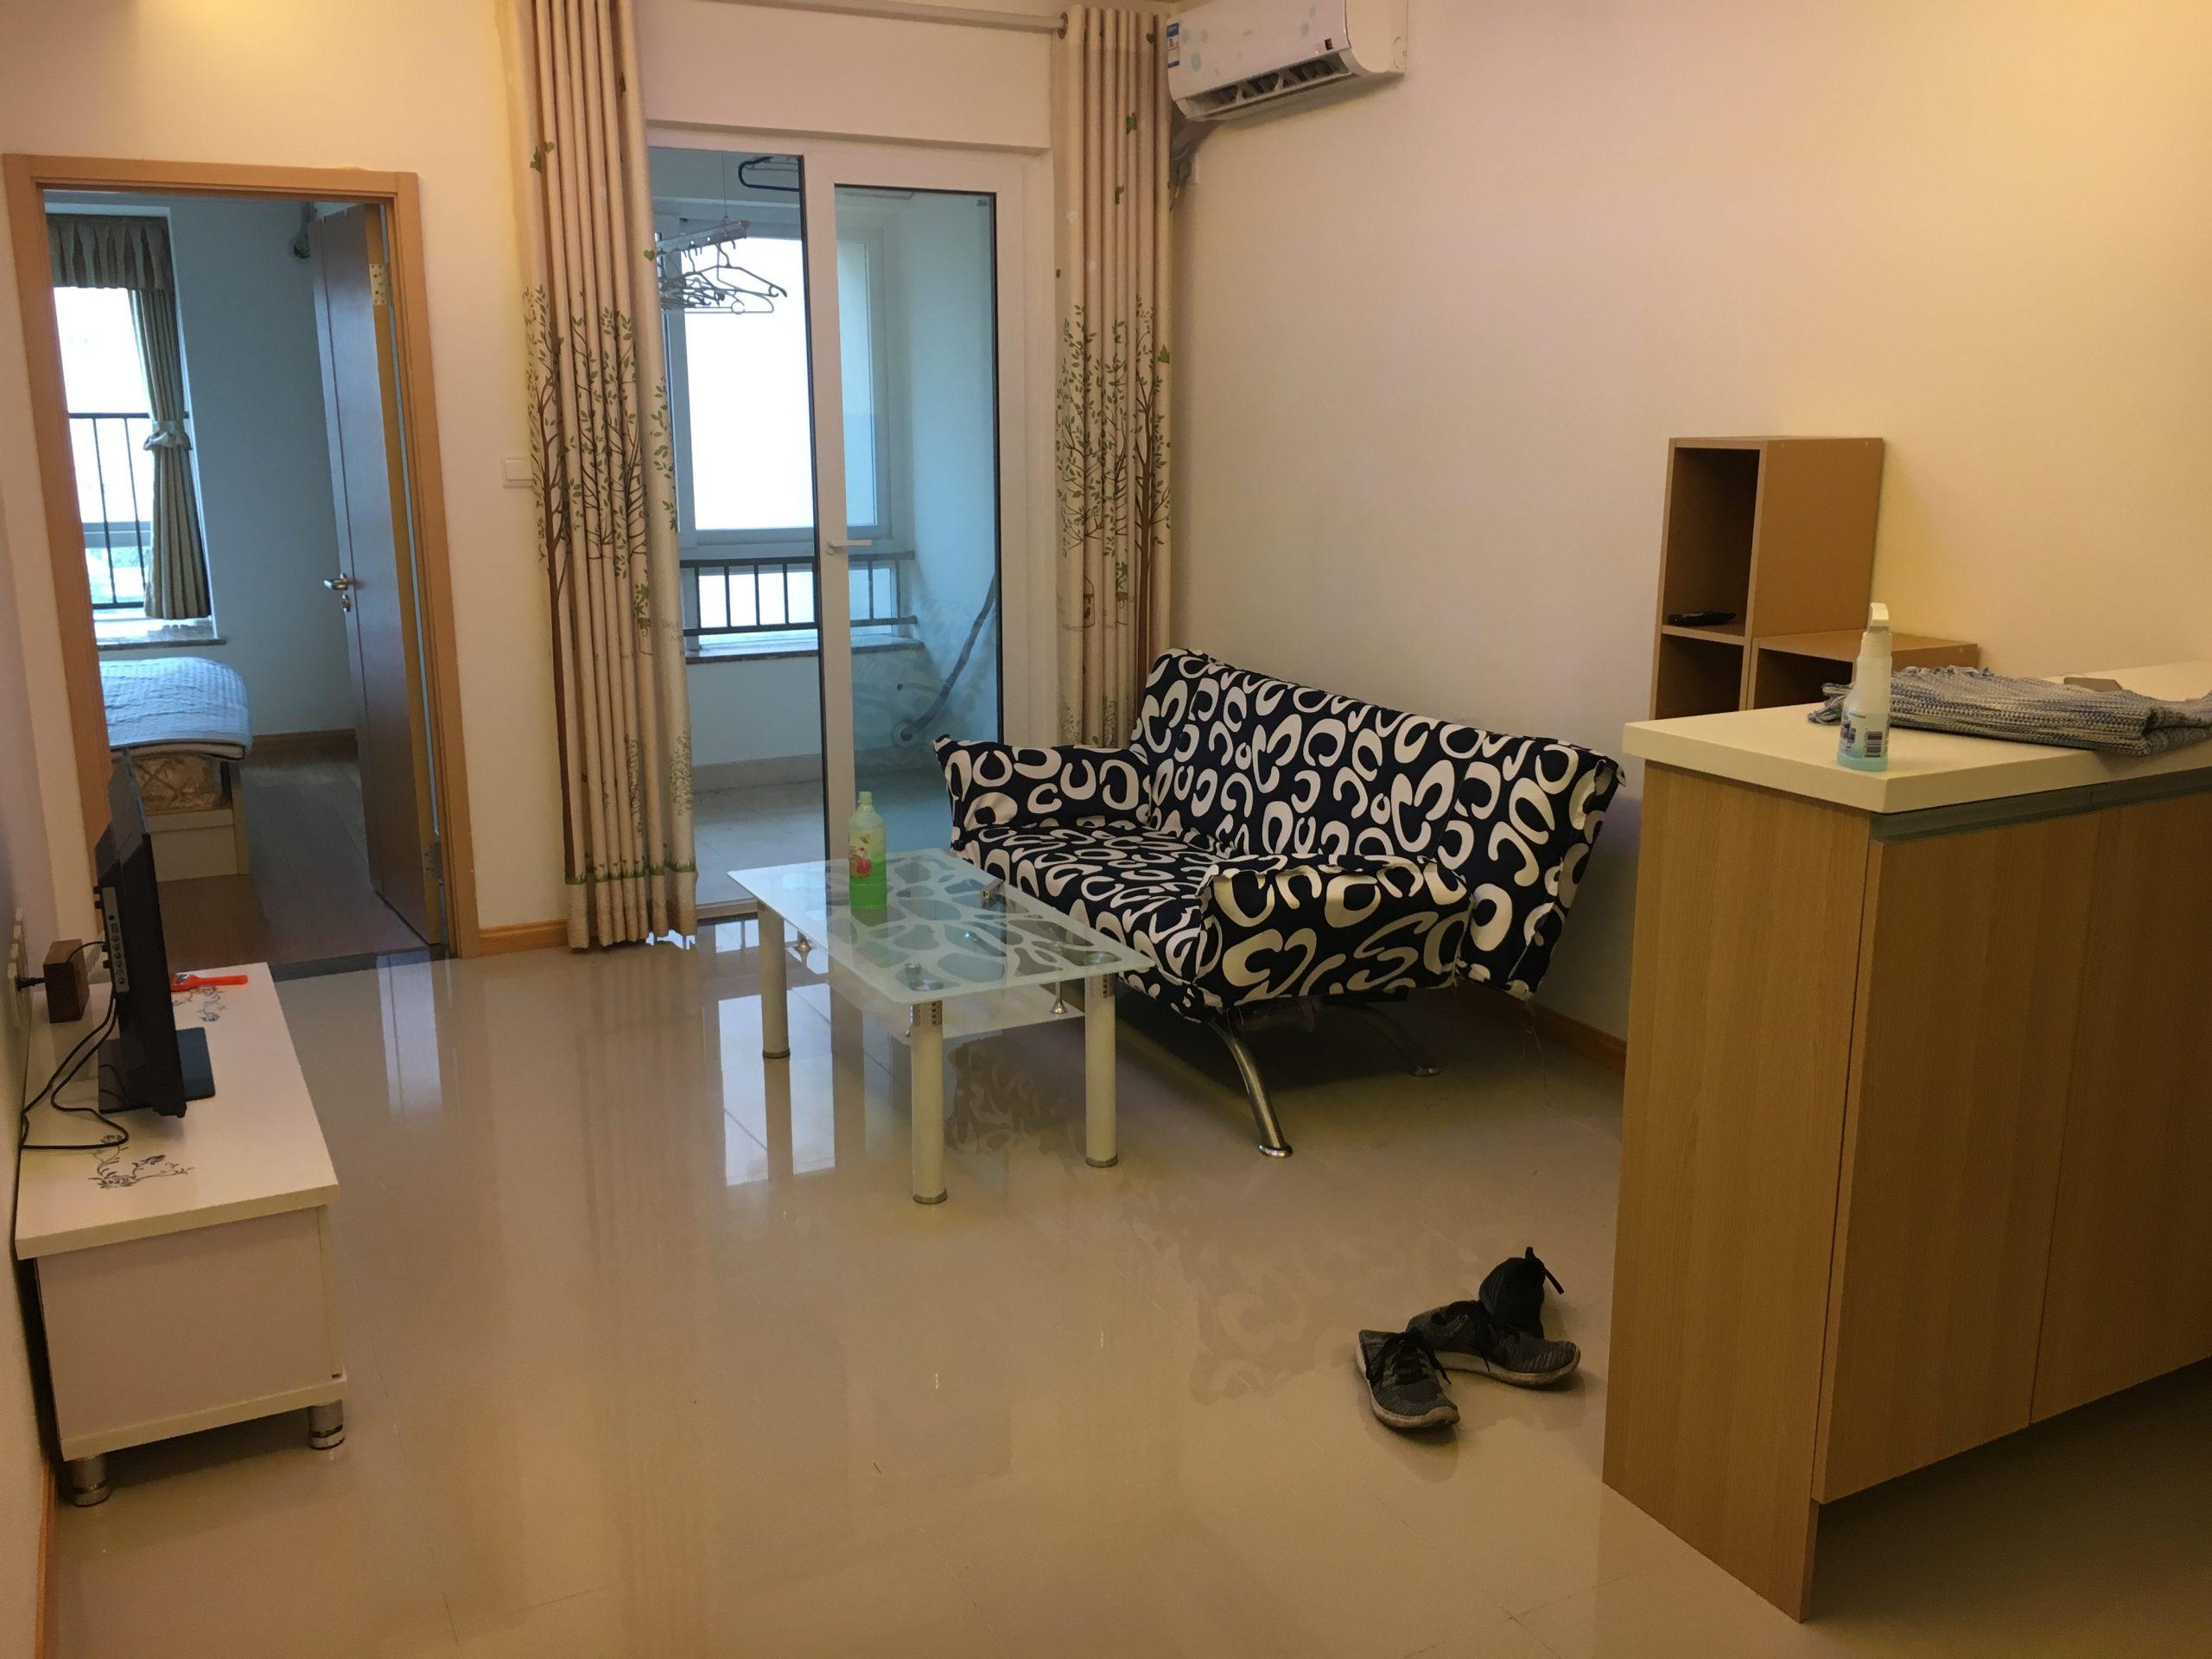 TEFL teachers apartment at EF Chongqing. Living room